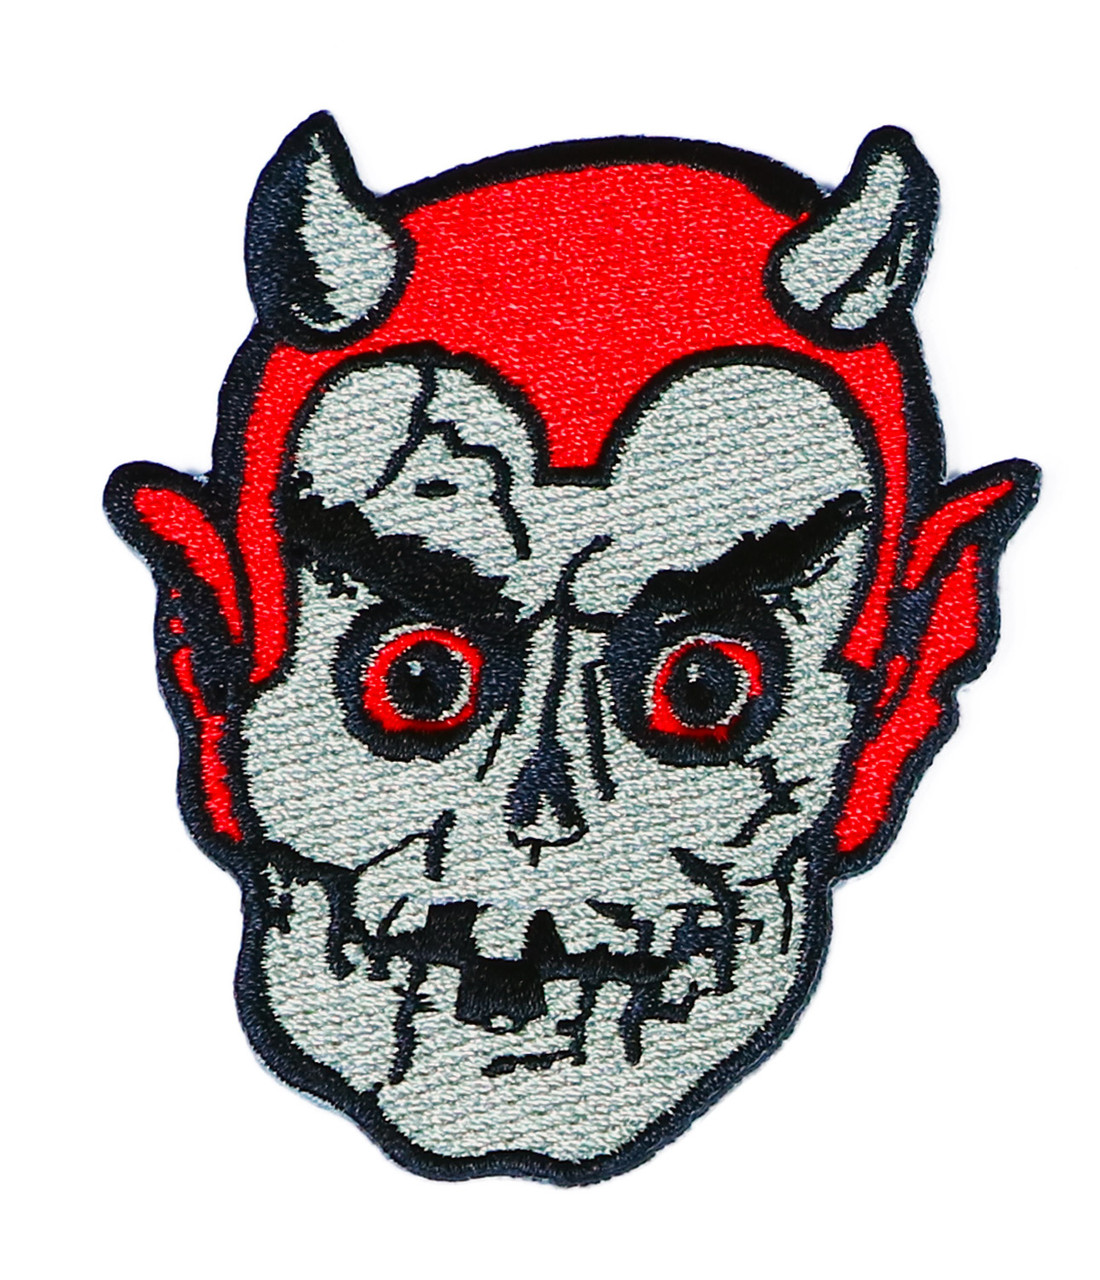 TOPSTONE HORROR Teen Werewolf Retro Horror Halloween Embroidered Patch NEW